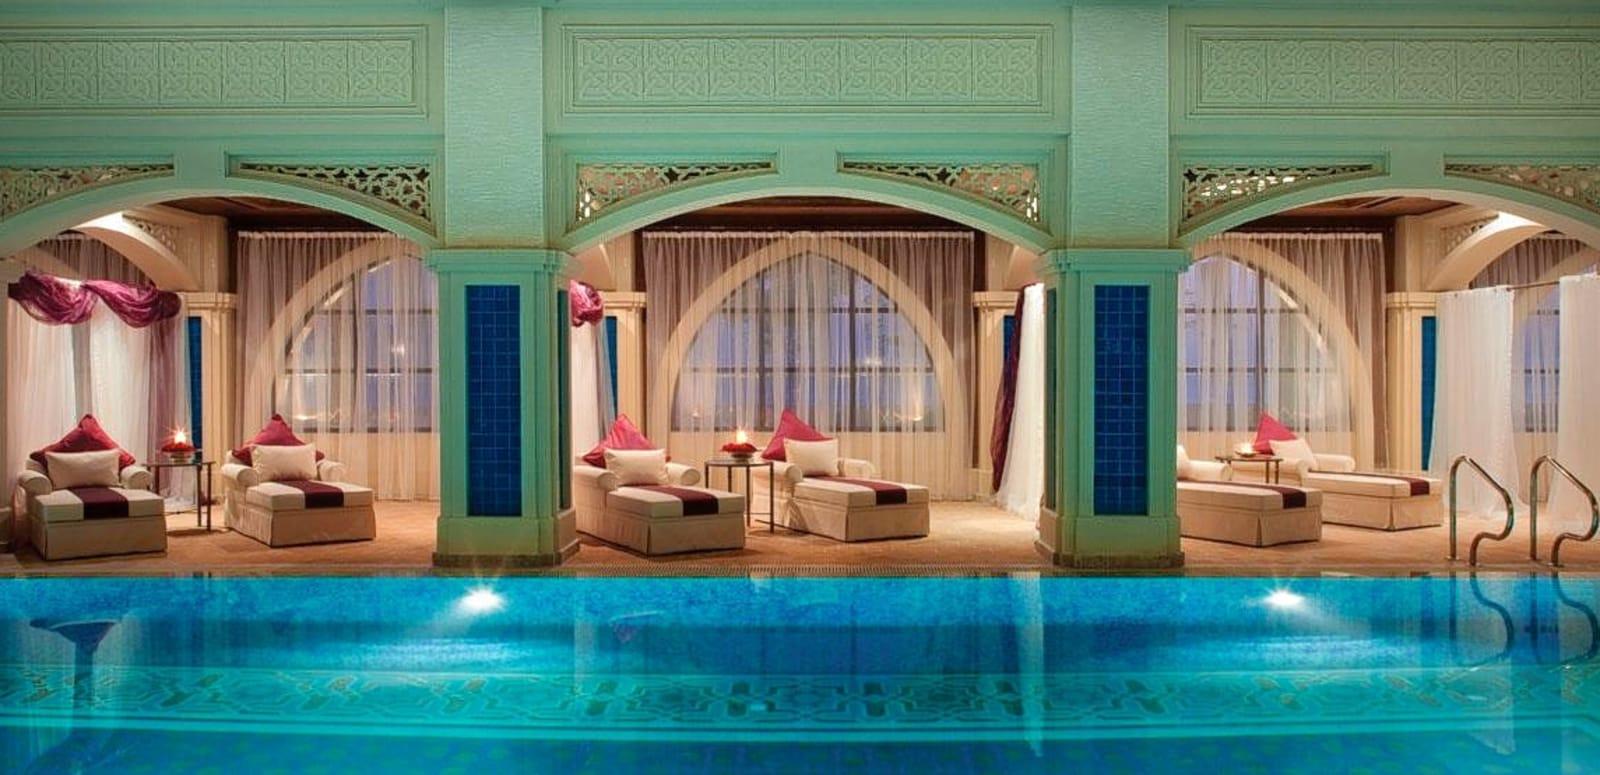 30 Best Spas in Dubai - 2019 Photos & Prices (Updated)